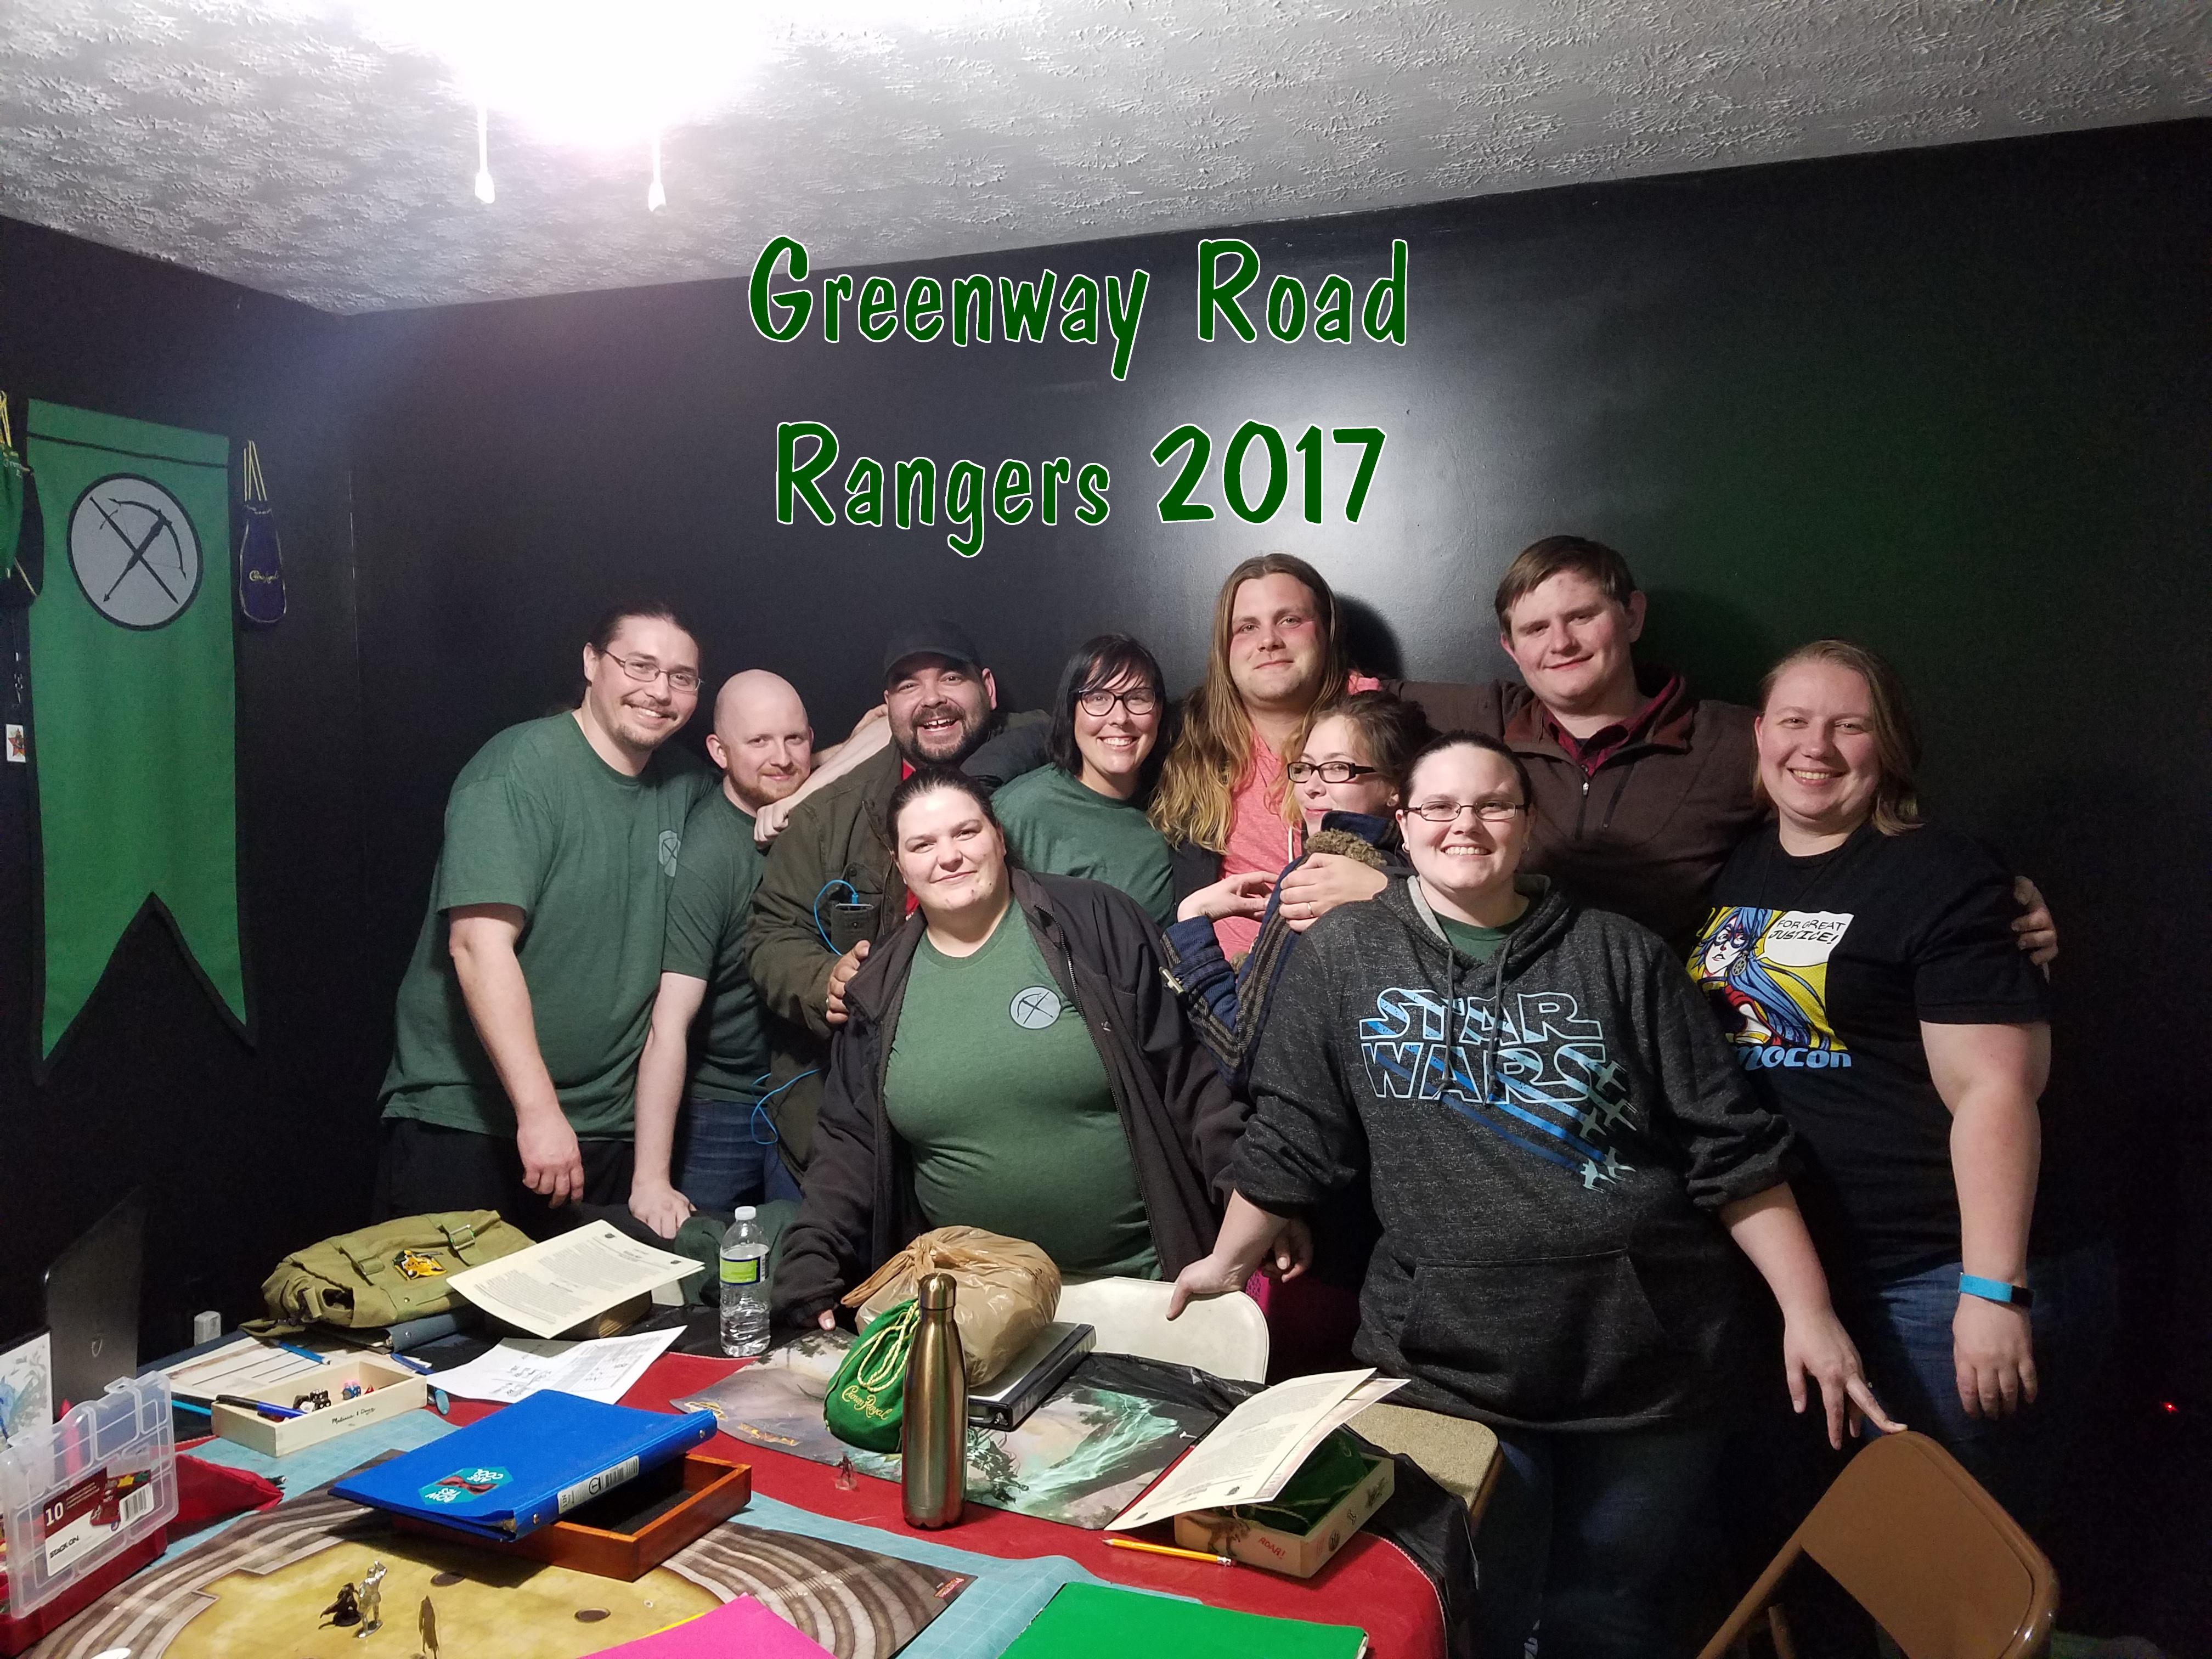 GreenwayRoadRangers2017.png